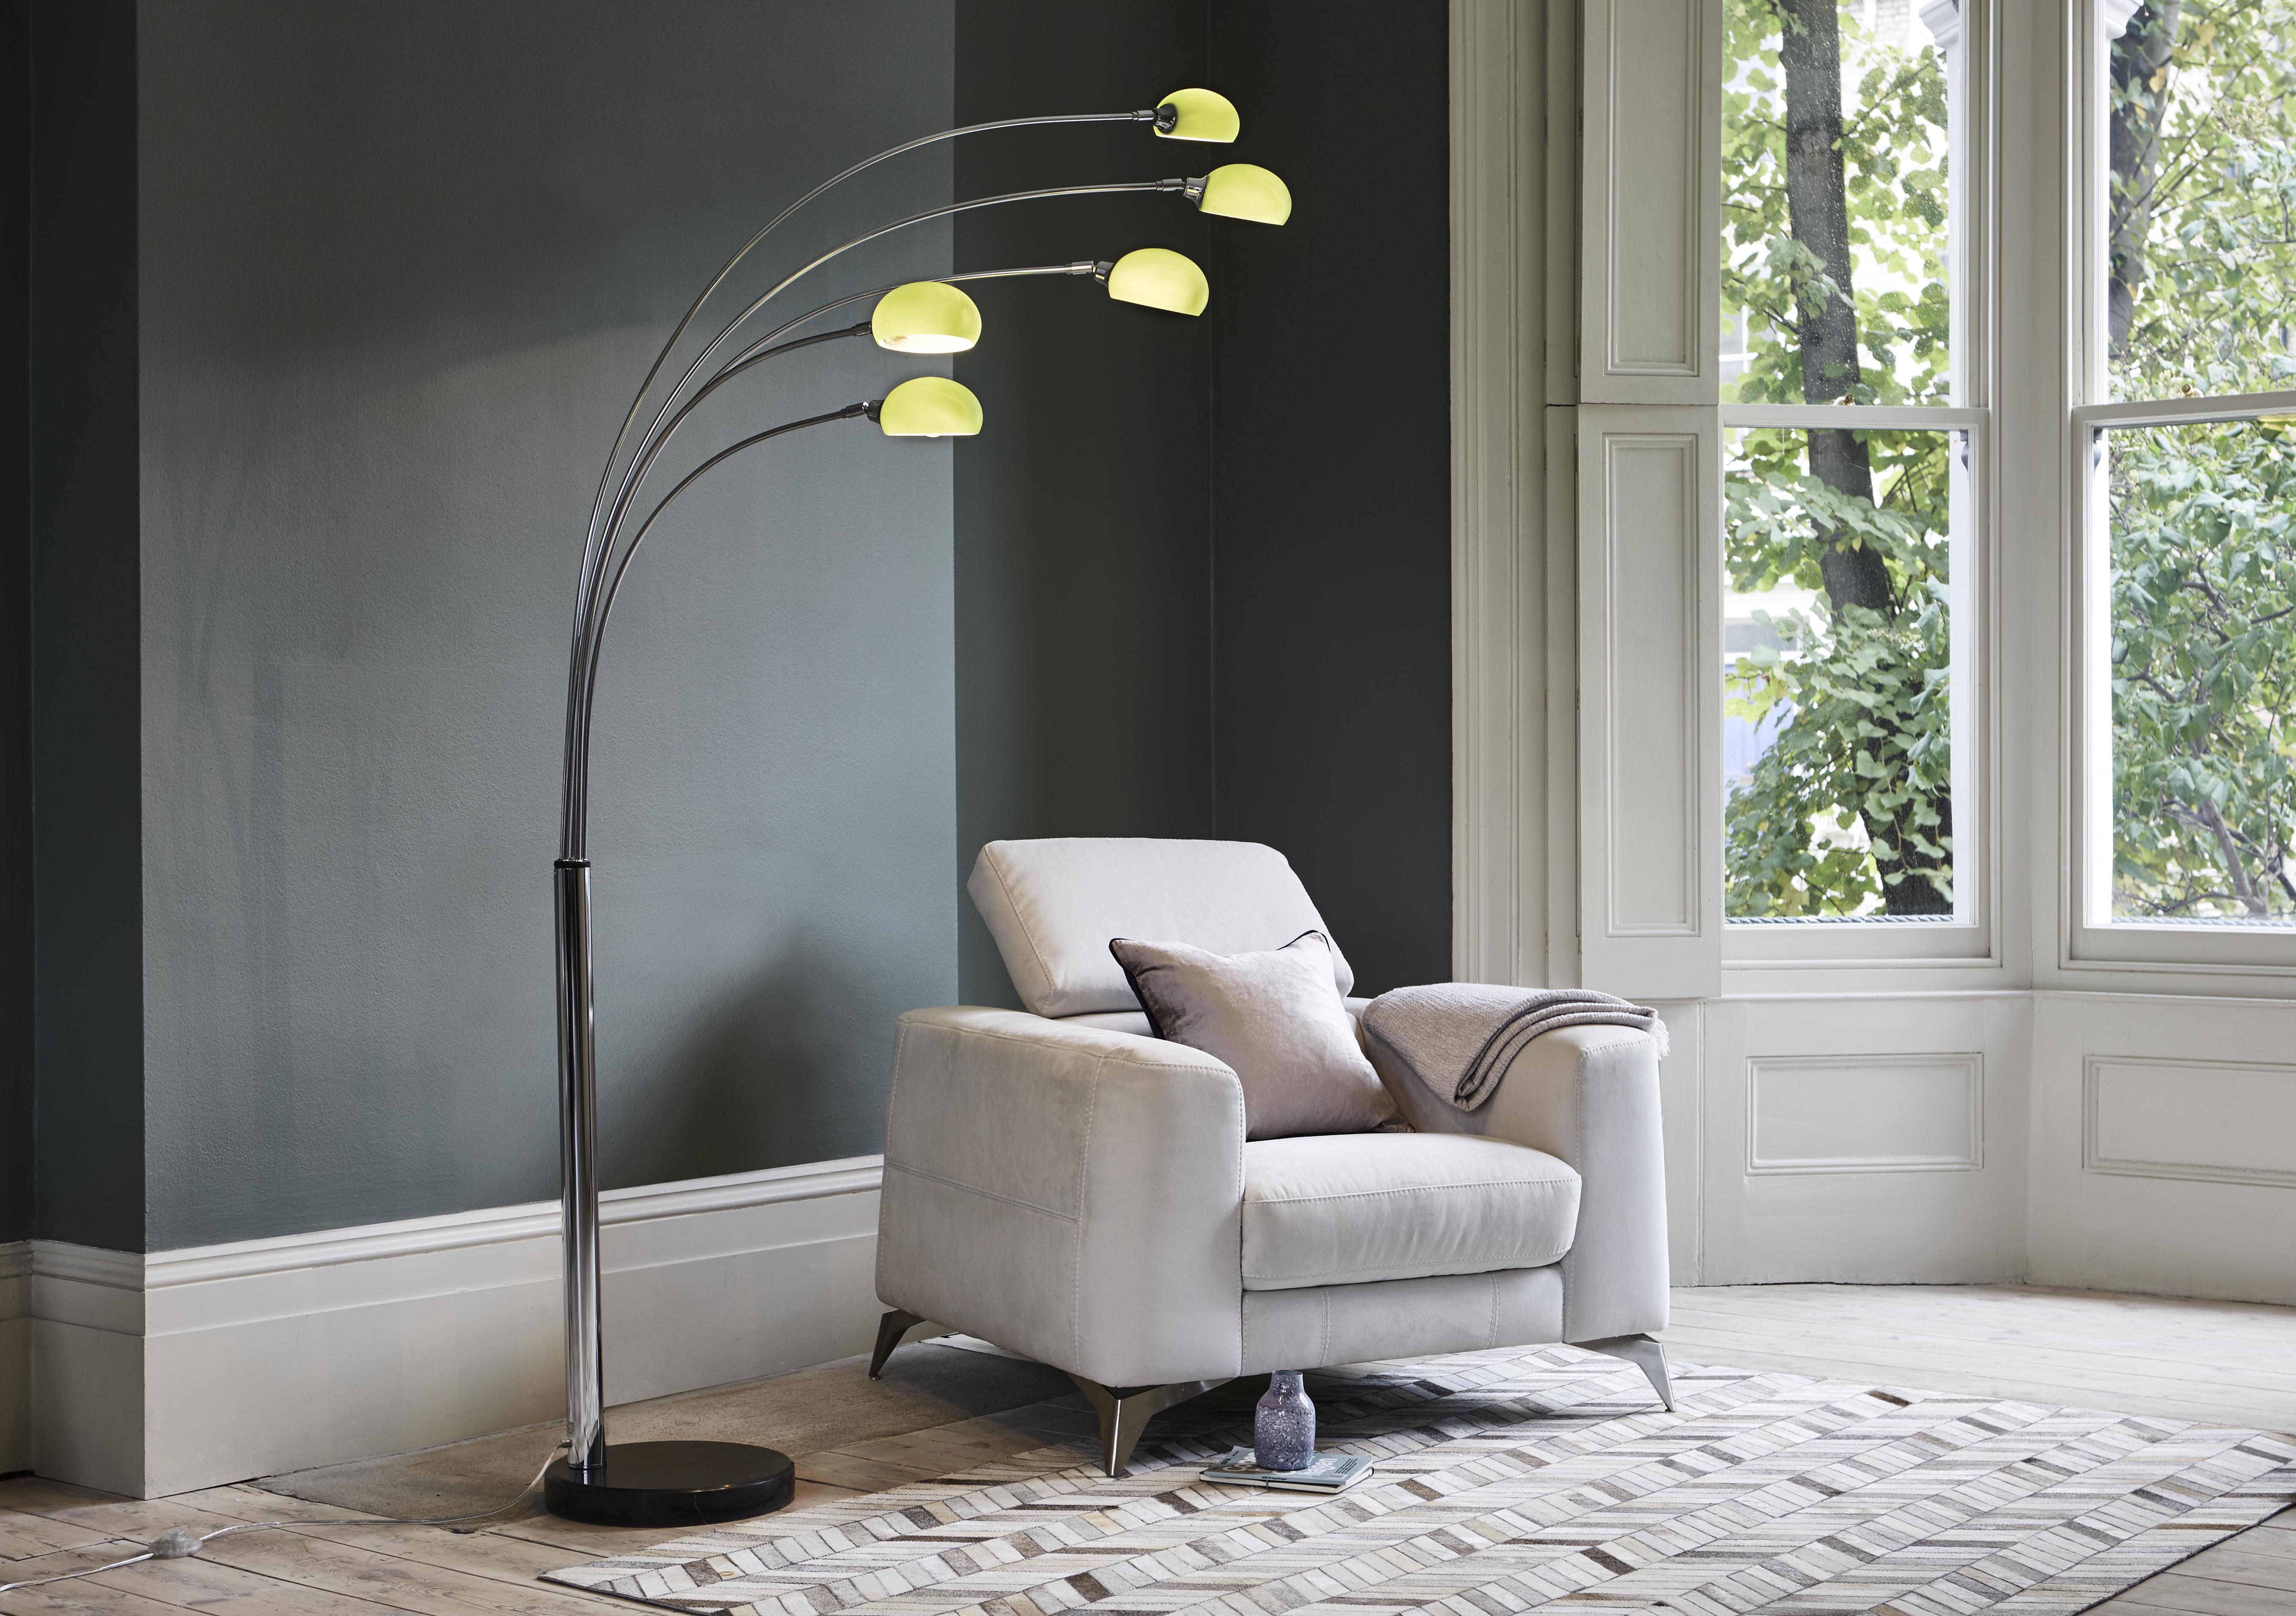 EXTRA 10% off & Floor lamps tripod u0026 standing lights - Furniture Village